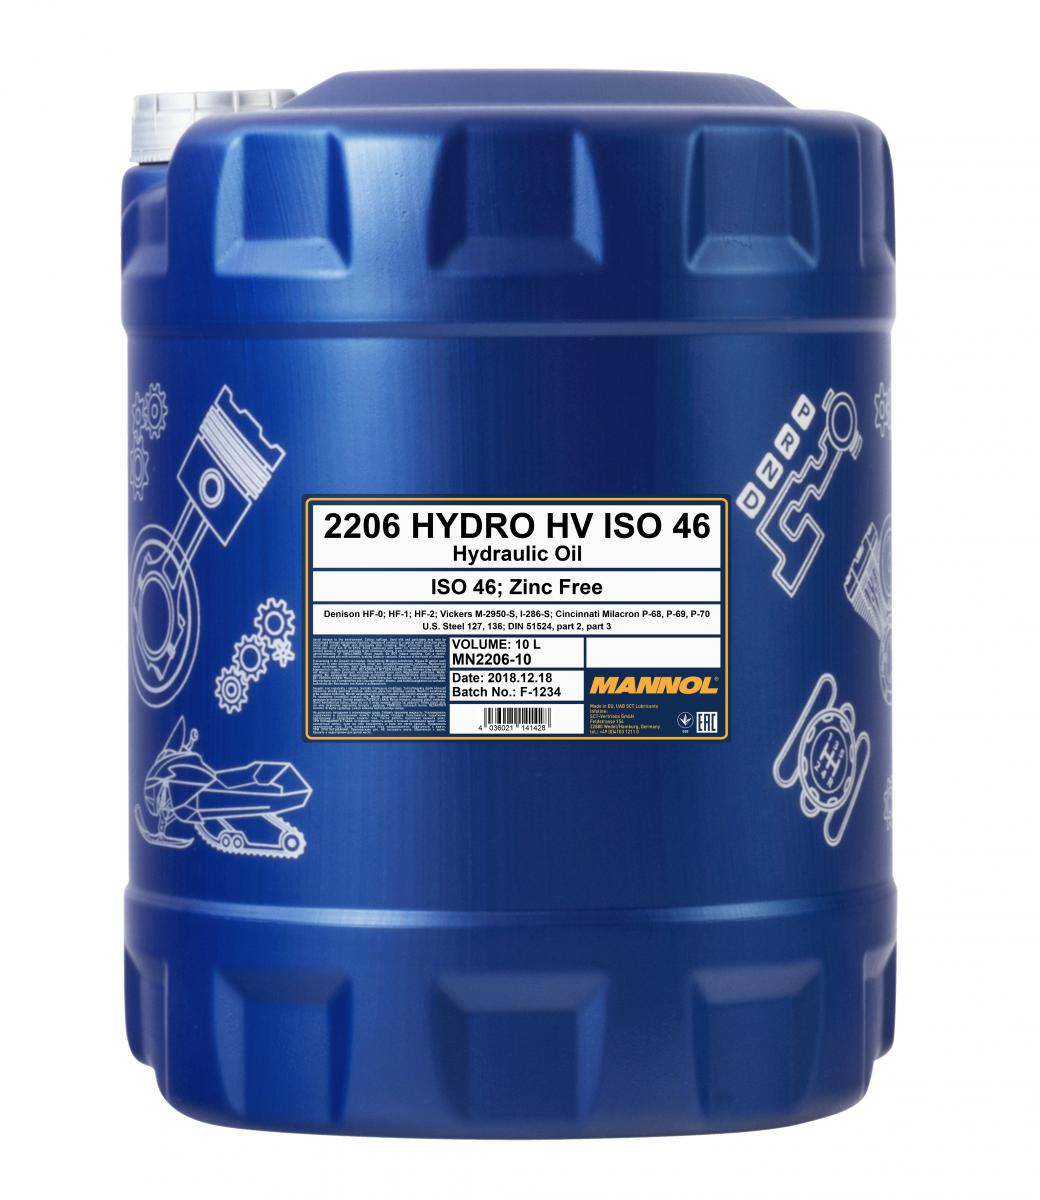 Hydro HV ISO 46 Zinc Free